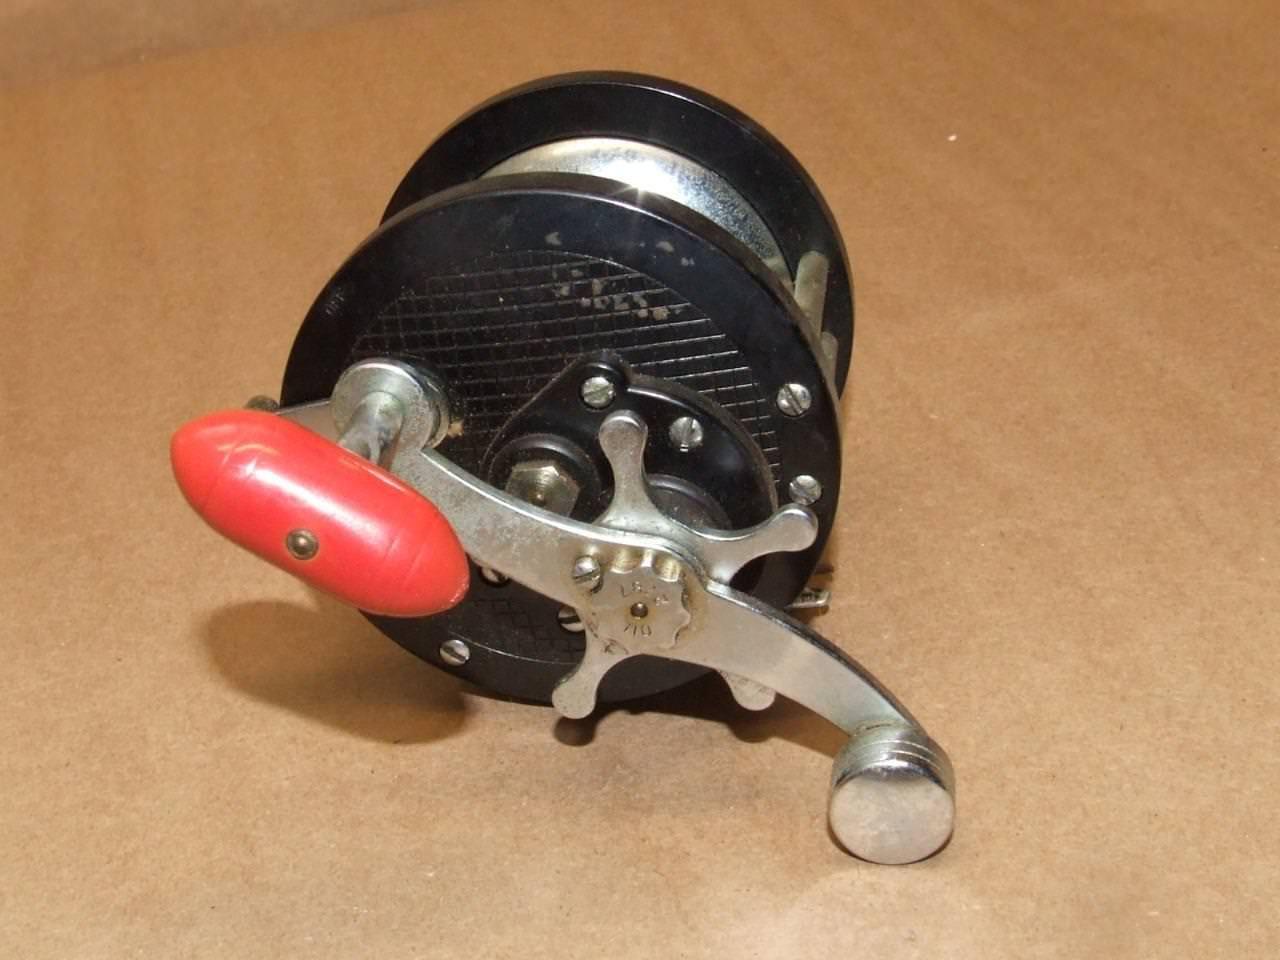 Vintage Lawrence Monospool Fishing Reel Made in USA   choose your favorite